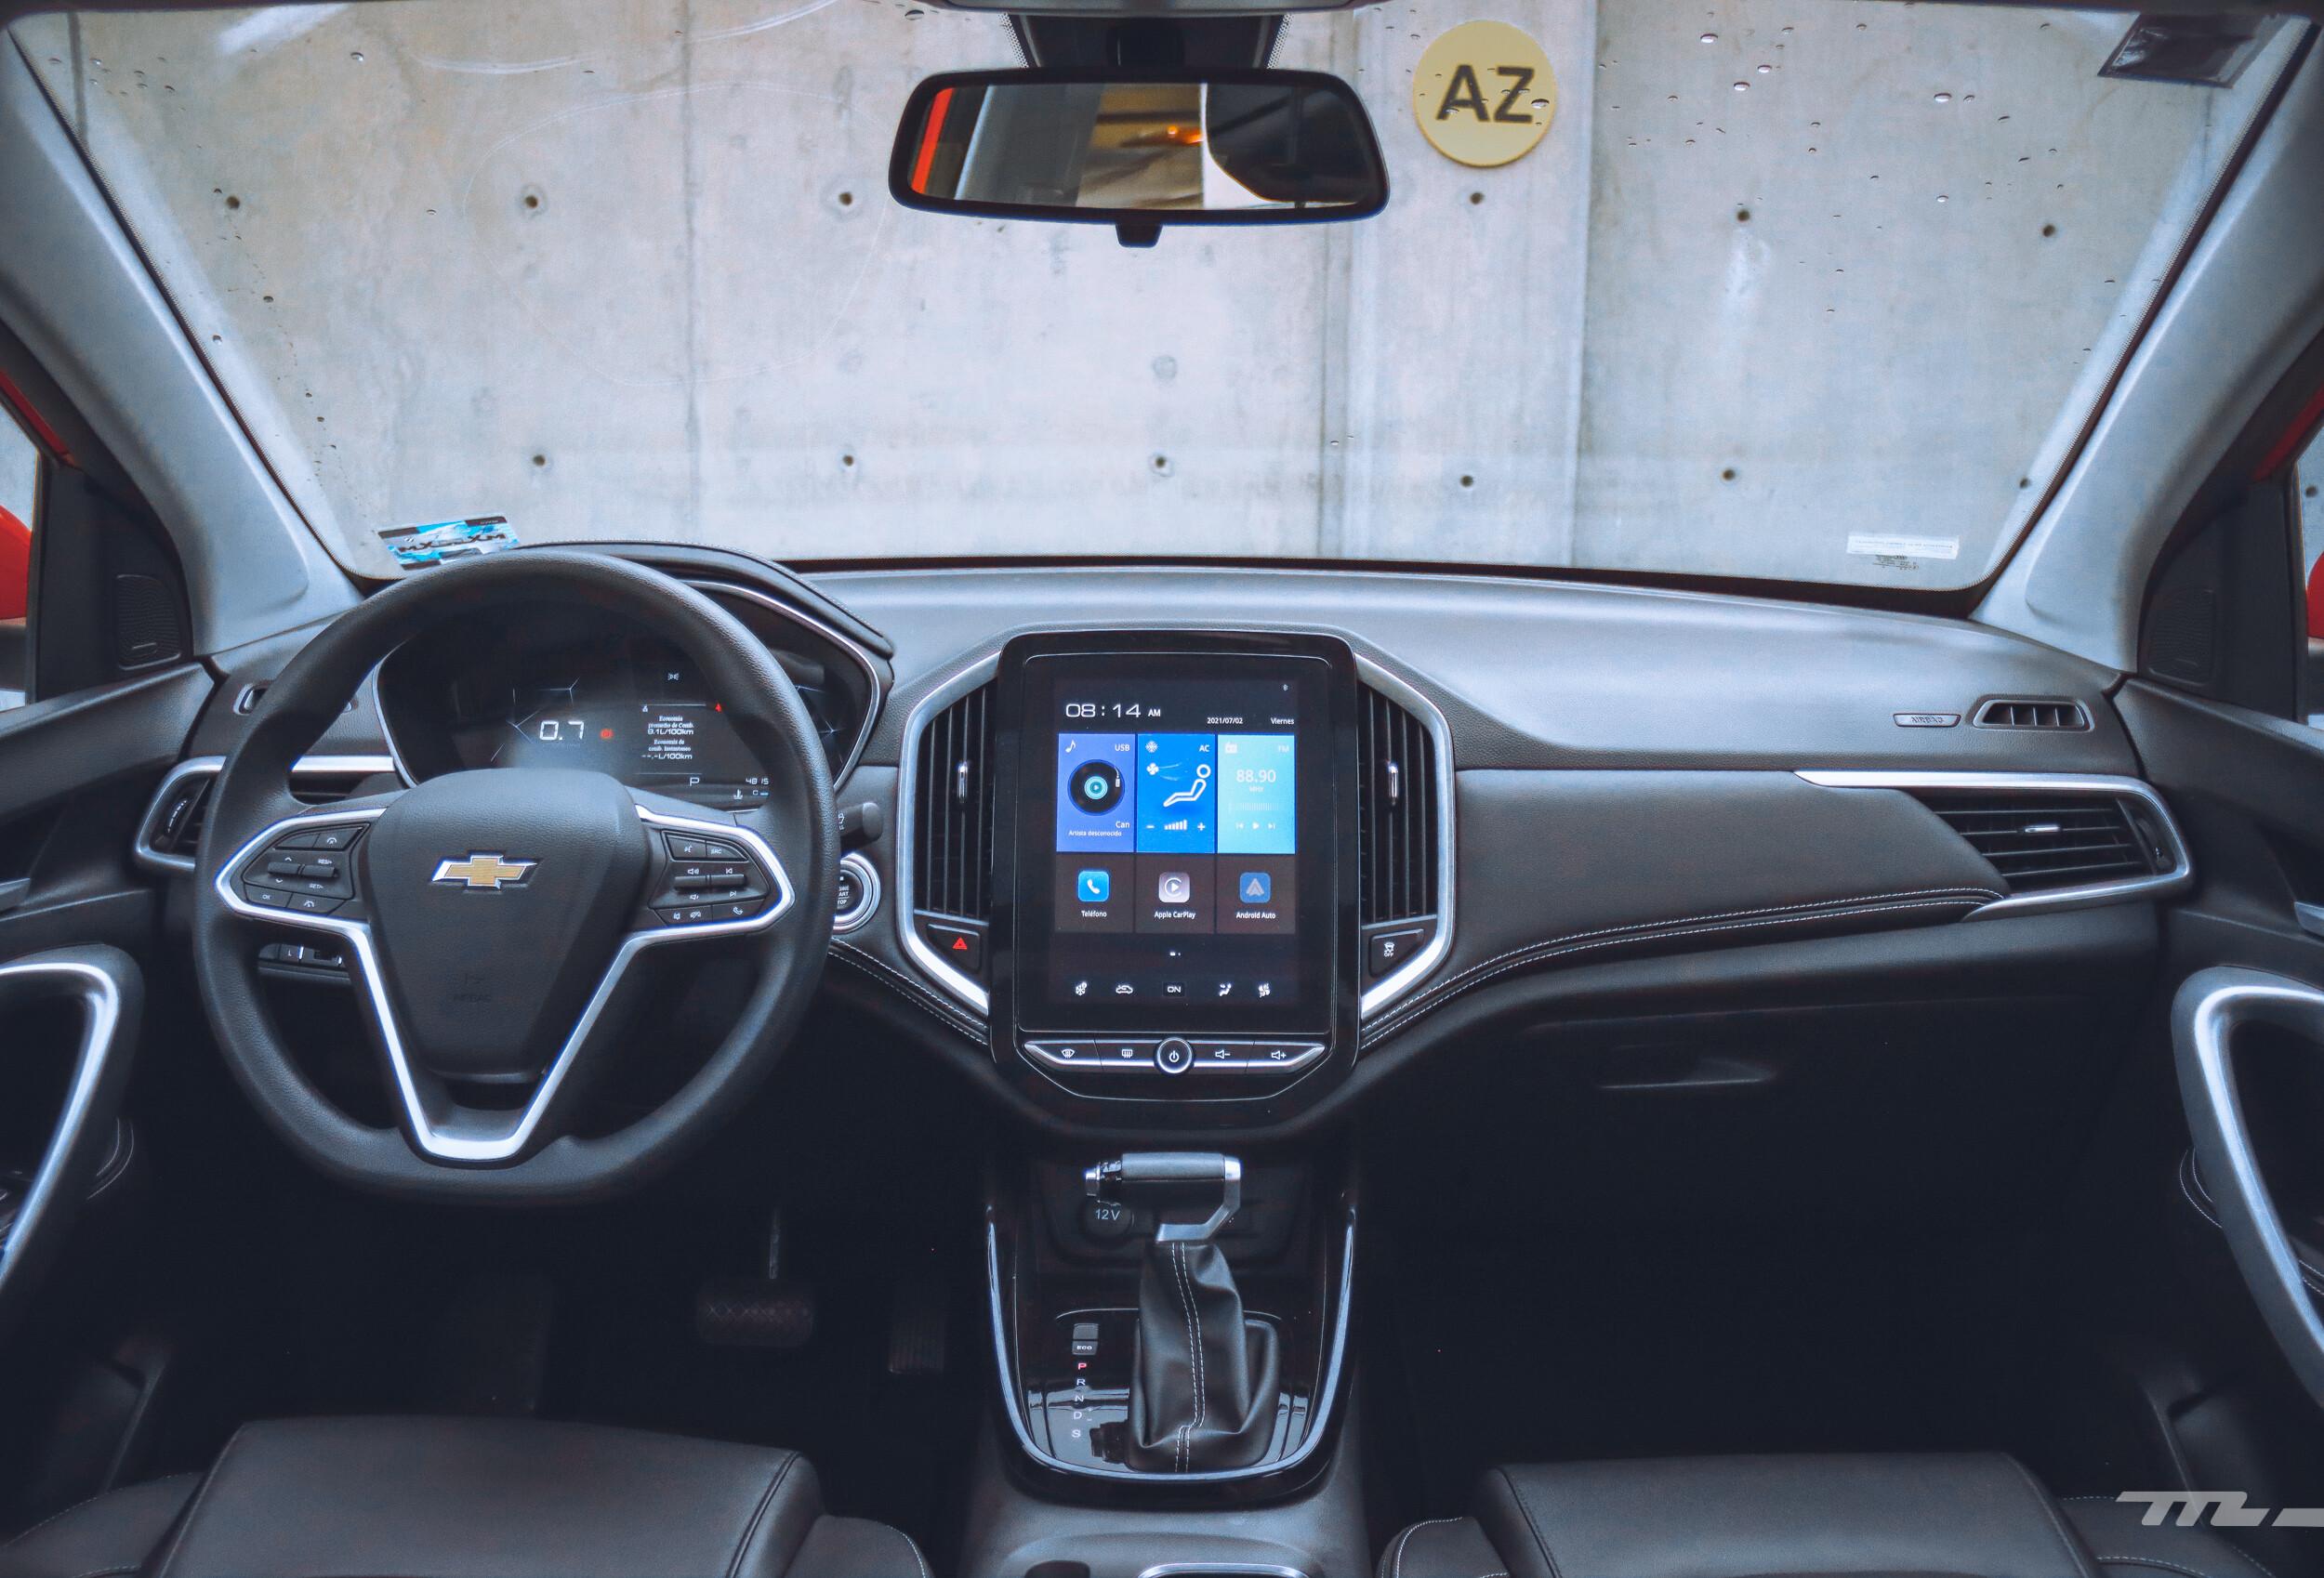 Foto de Chevrolet Captiva 2022 (45/54)